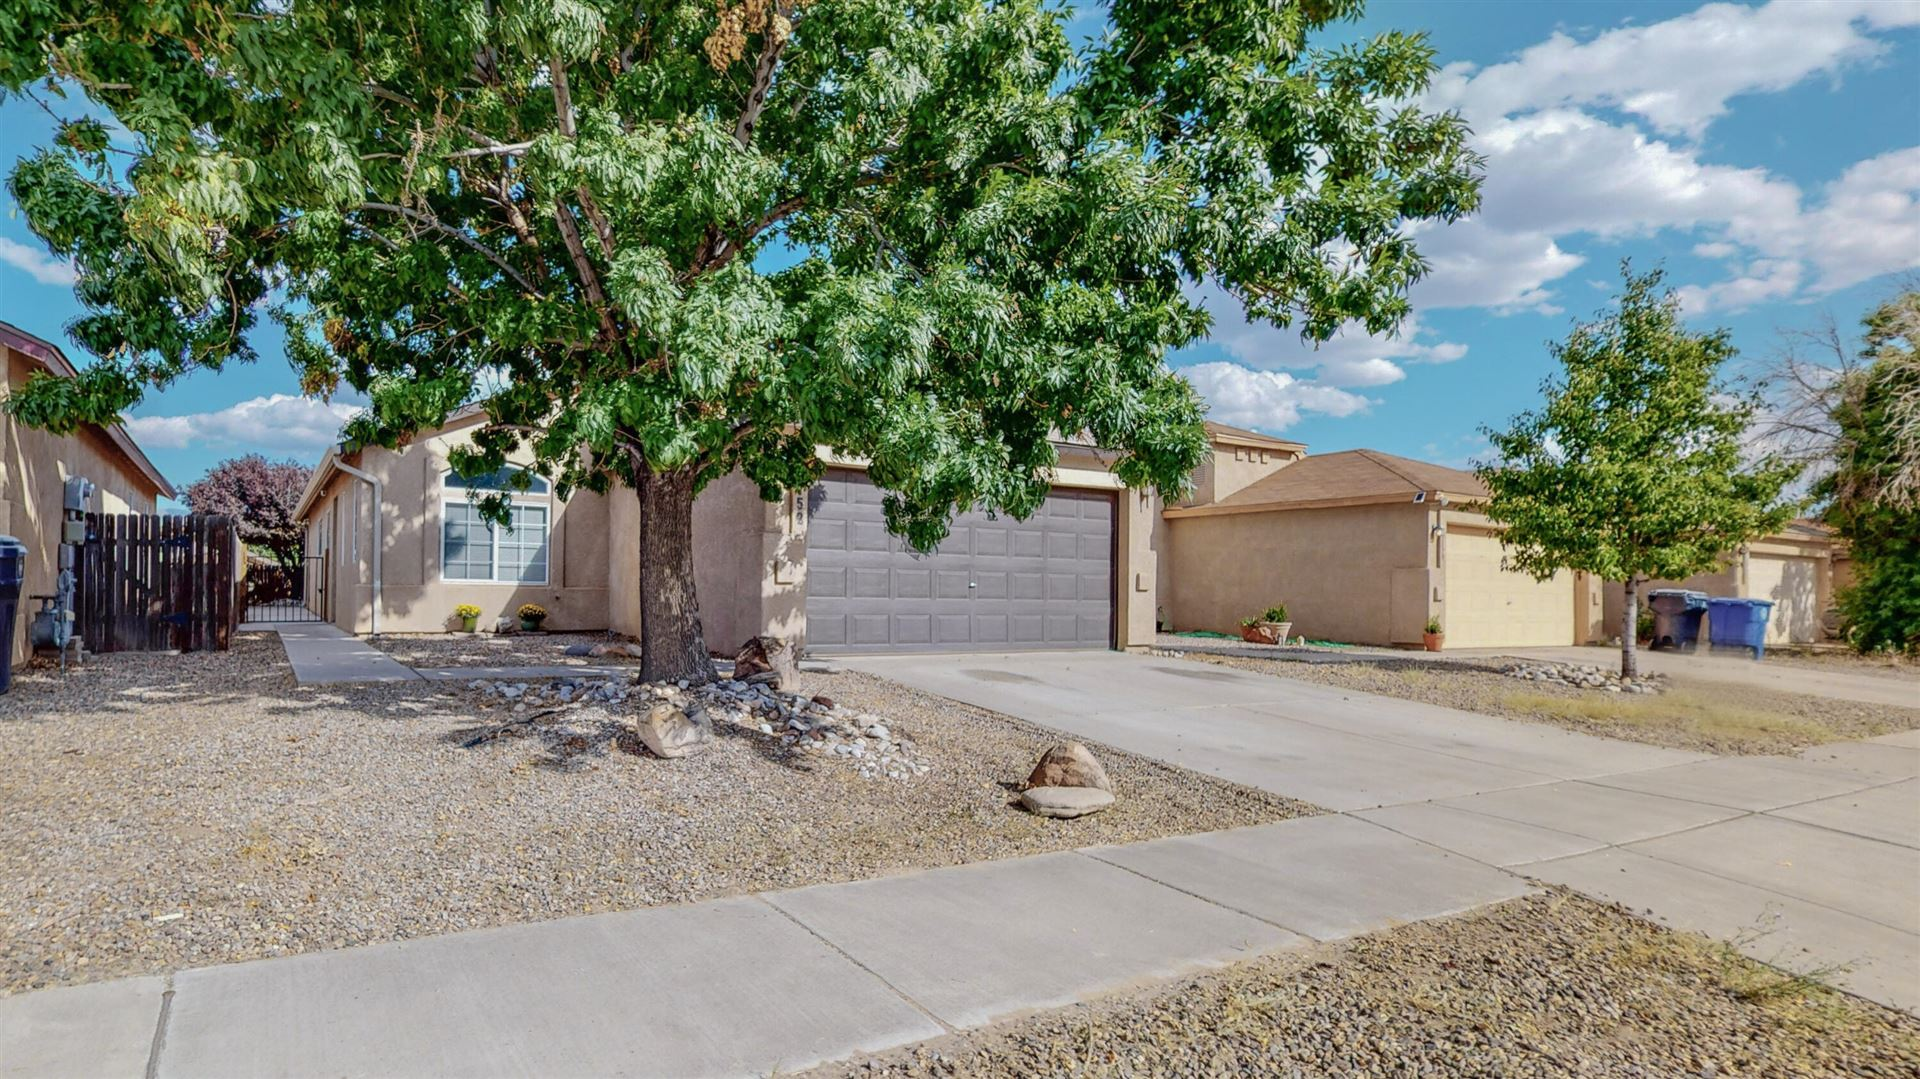 10752 SHOOTING STAR Street NW, Albuquerque, NM 87114 - #: 1001202